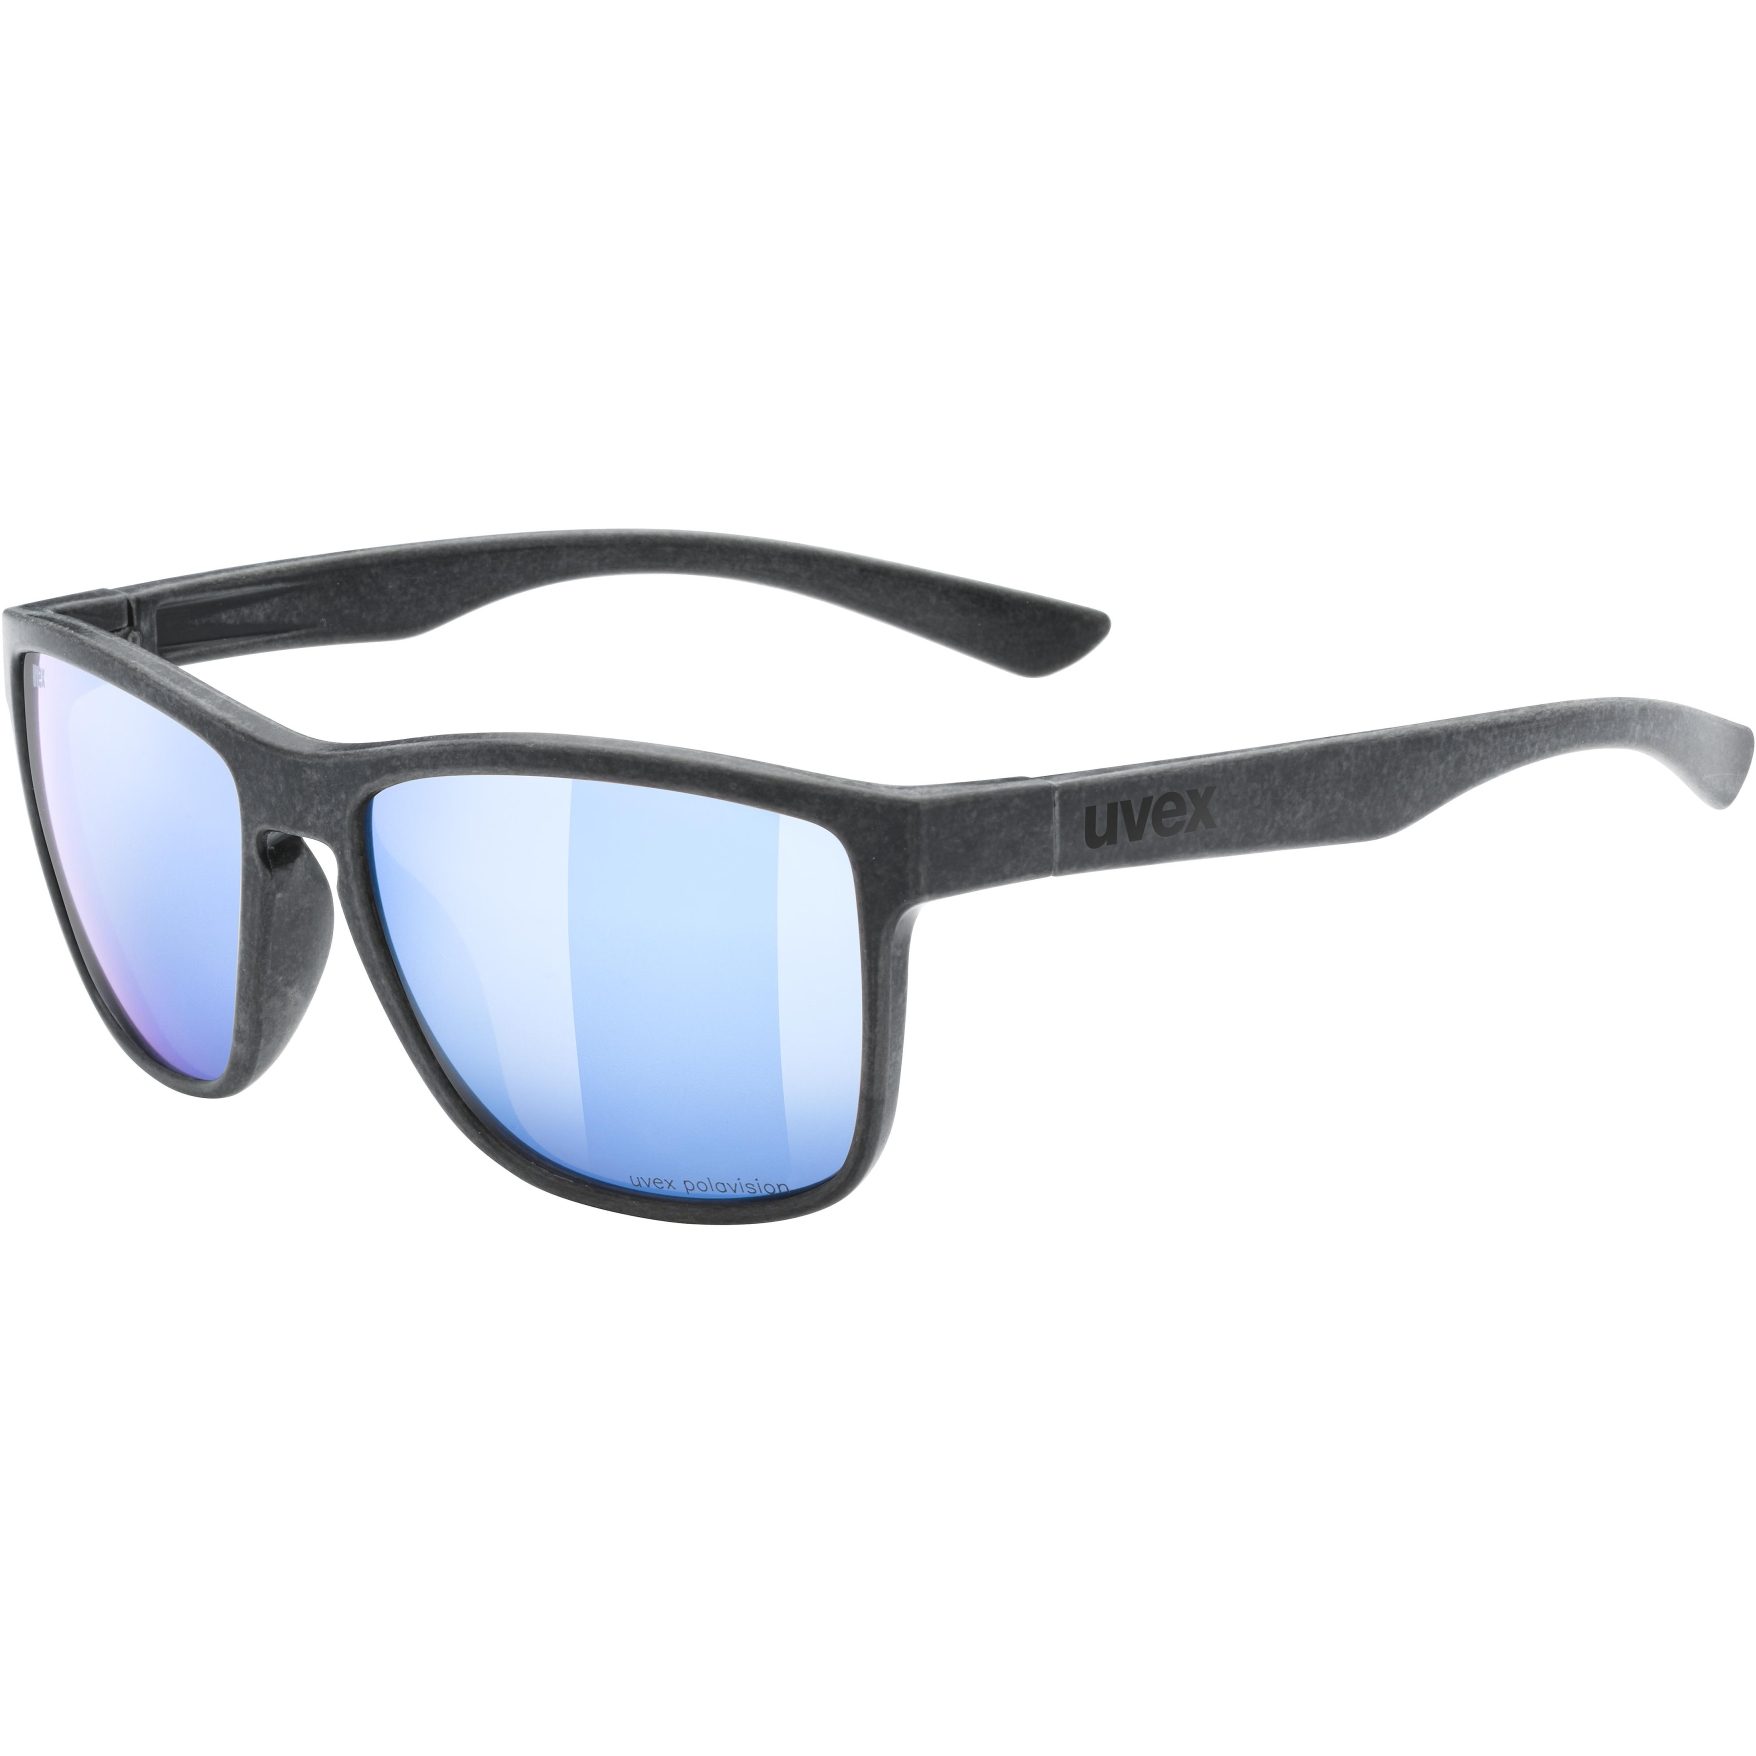 Uvex lgl ocean 2 P Brille - black mat/polavision mirror blue